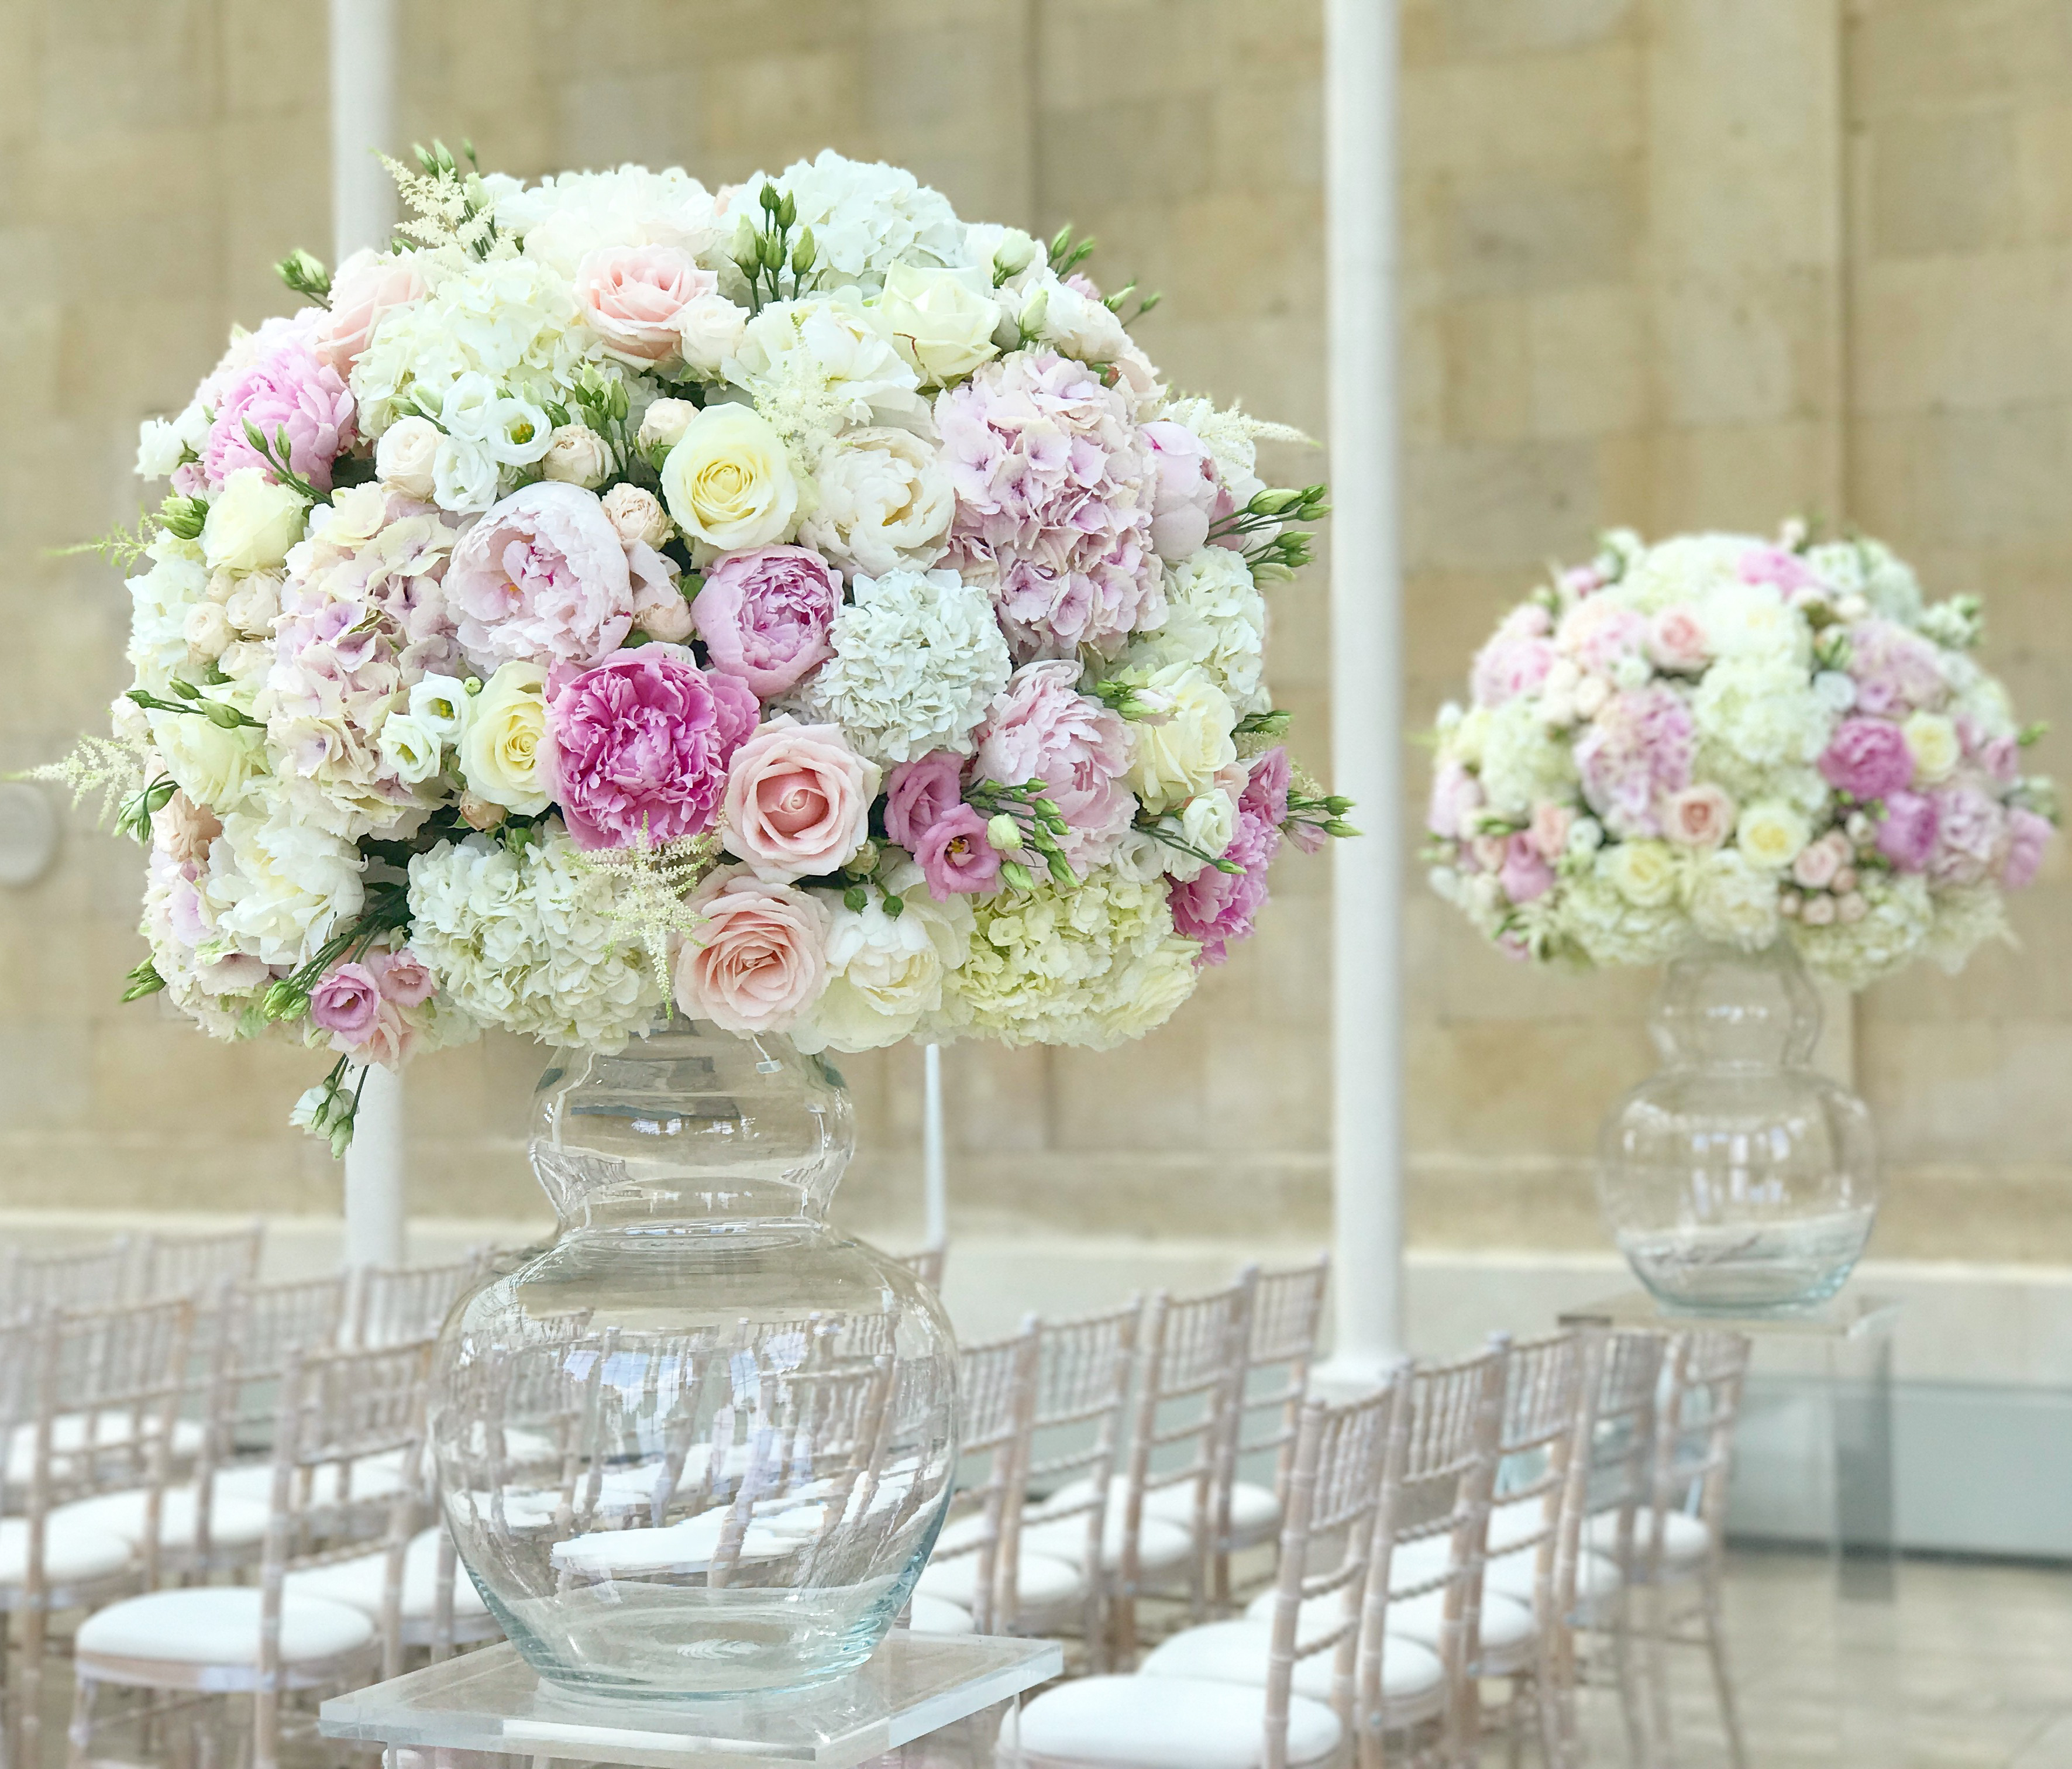 June Wedding Flowers: Mary Jane Vaughan: Award-Winning London Wedding & Event